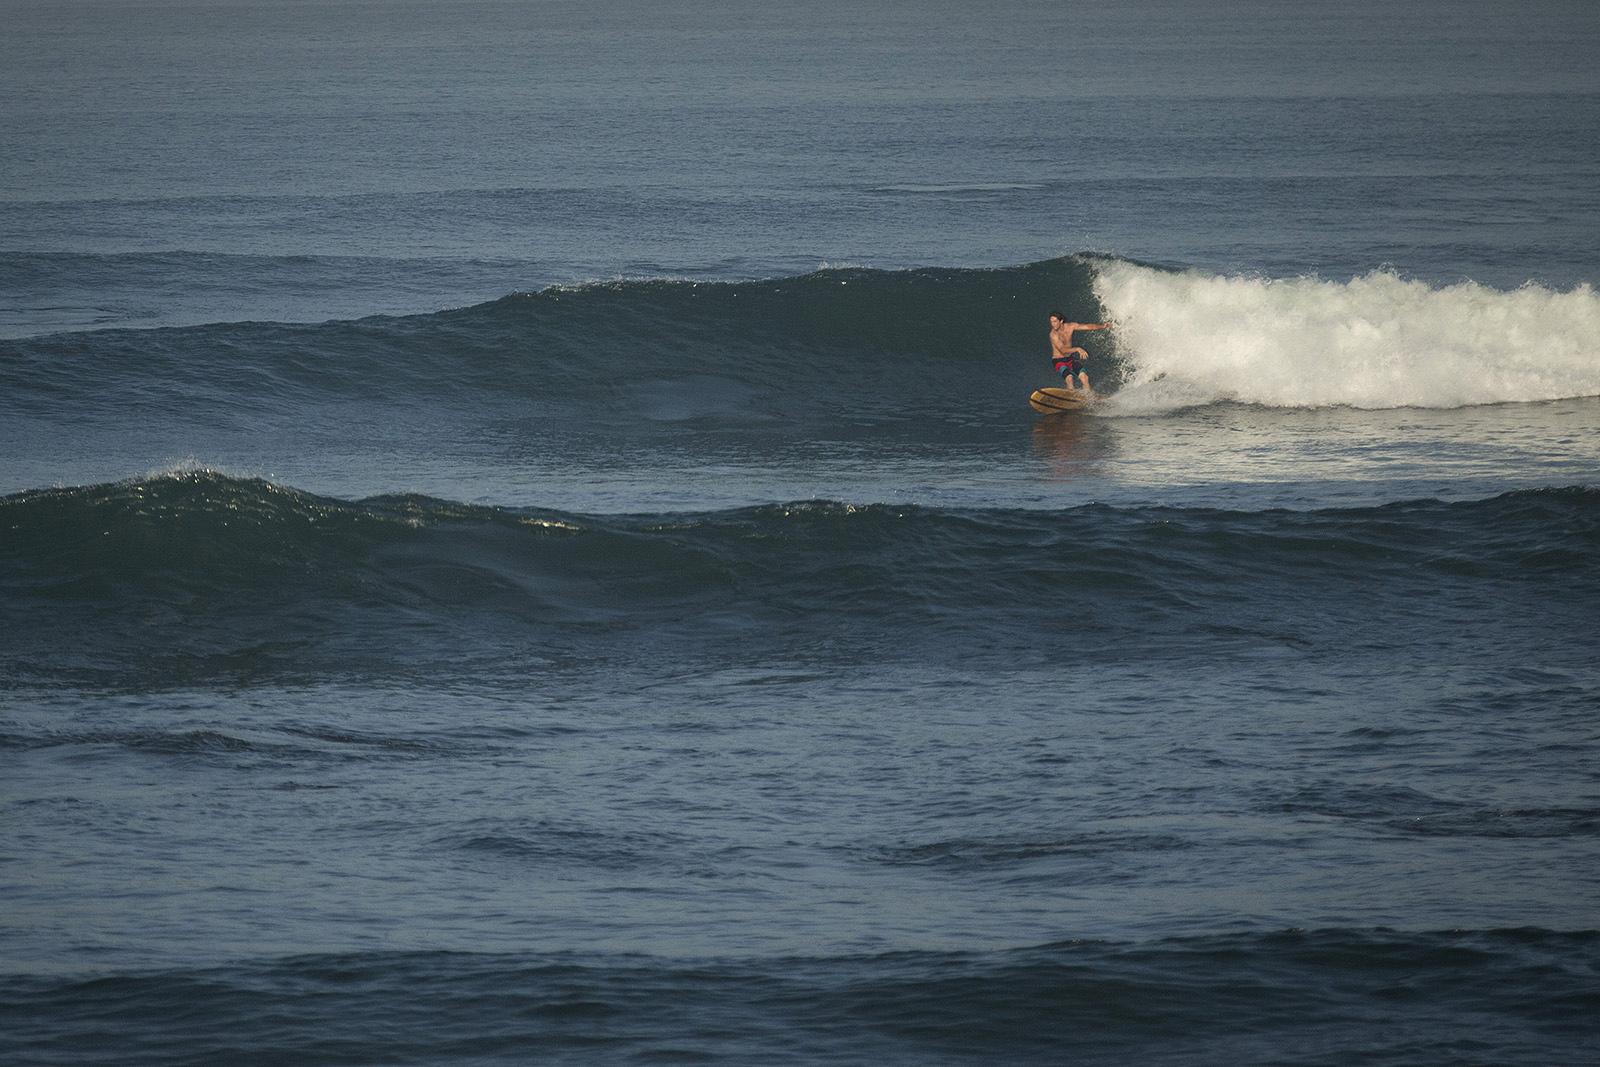 Cam McCaul surfing Bali.